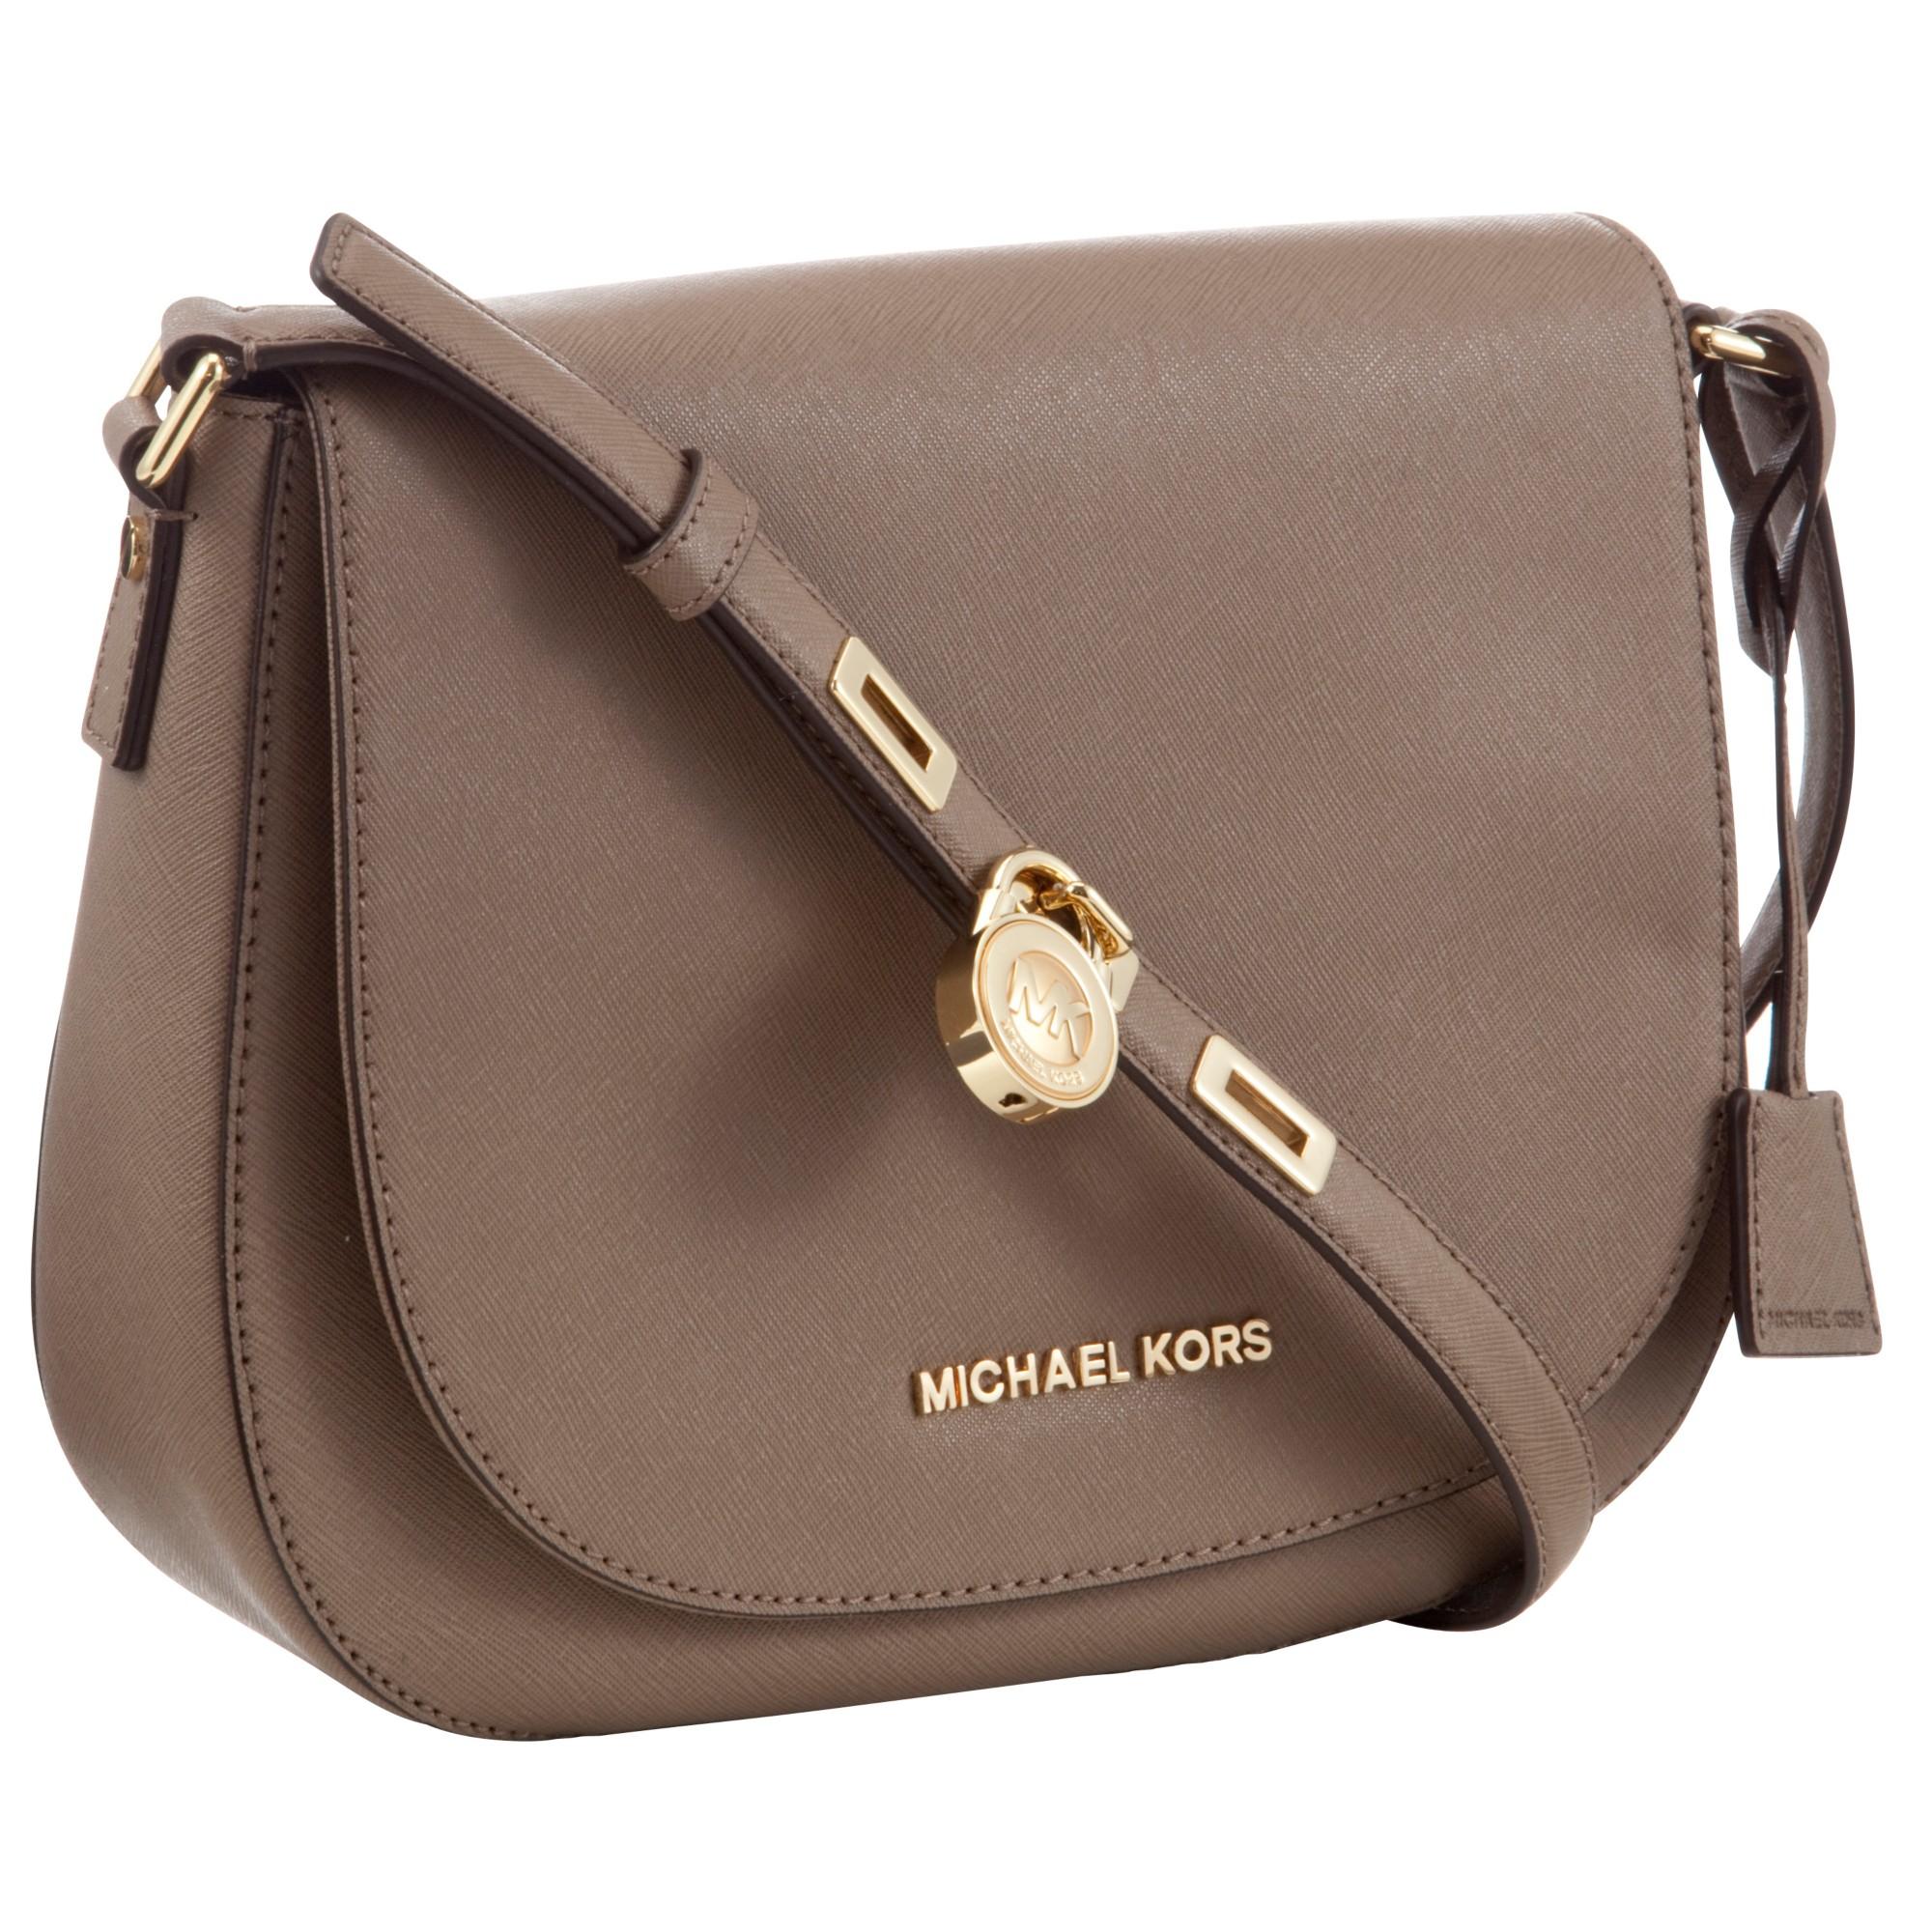 Michael Kors Hamilton Leather Large Messenger Bag